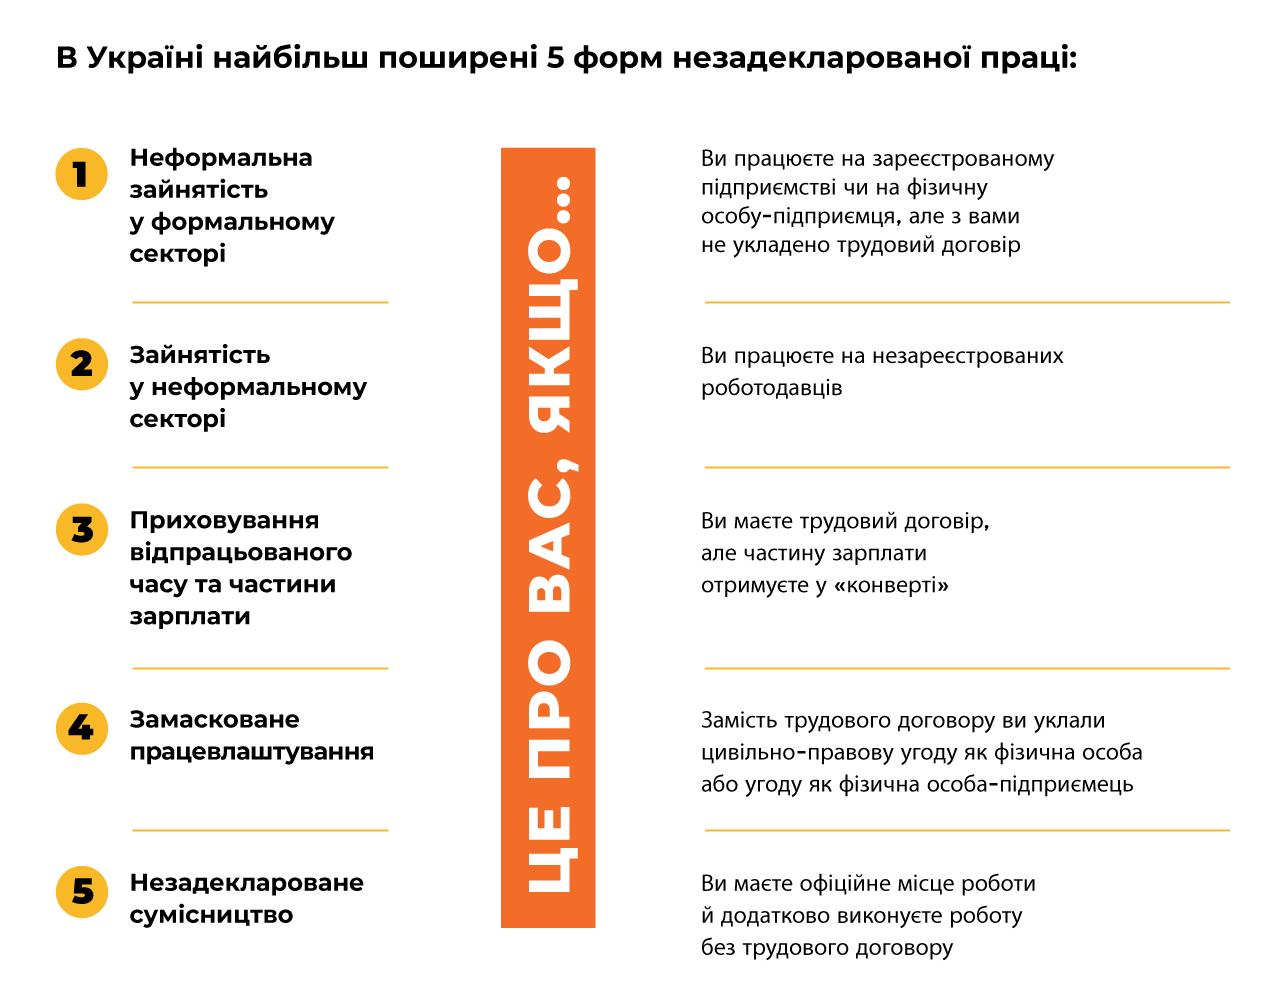 https://dsp.gov.ua/wp-content/uploads/2020/01/ilo_infographic1_1_ukr-e1579623588986.png